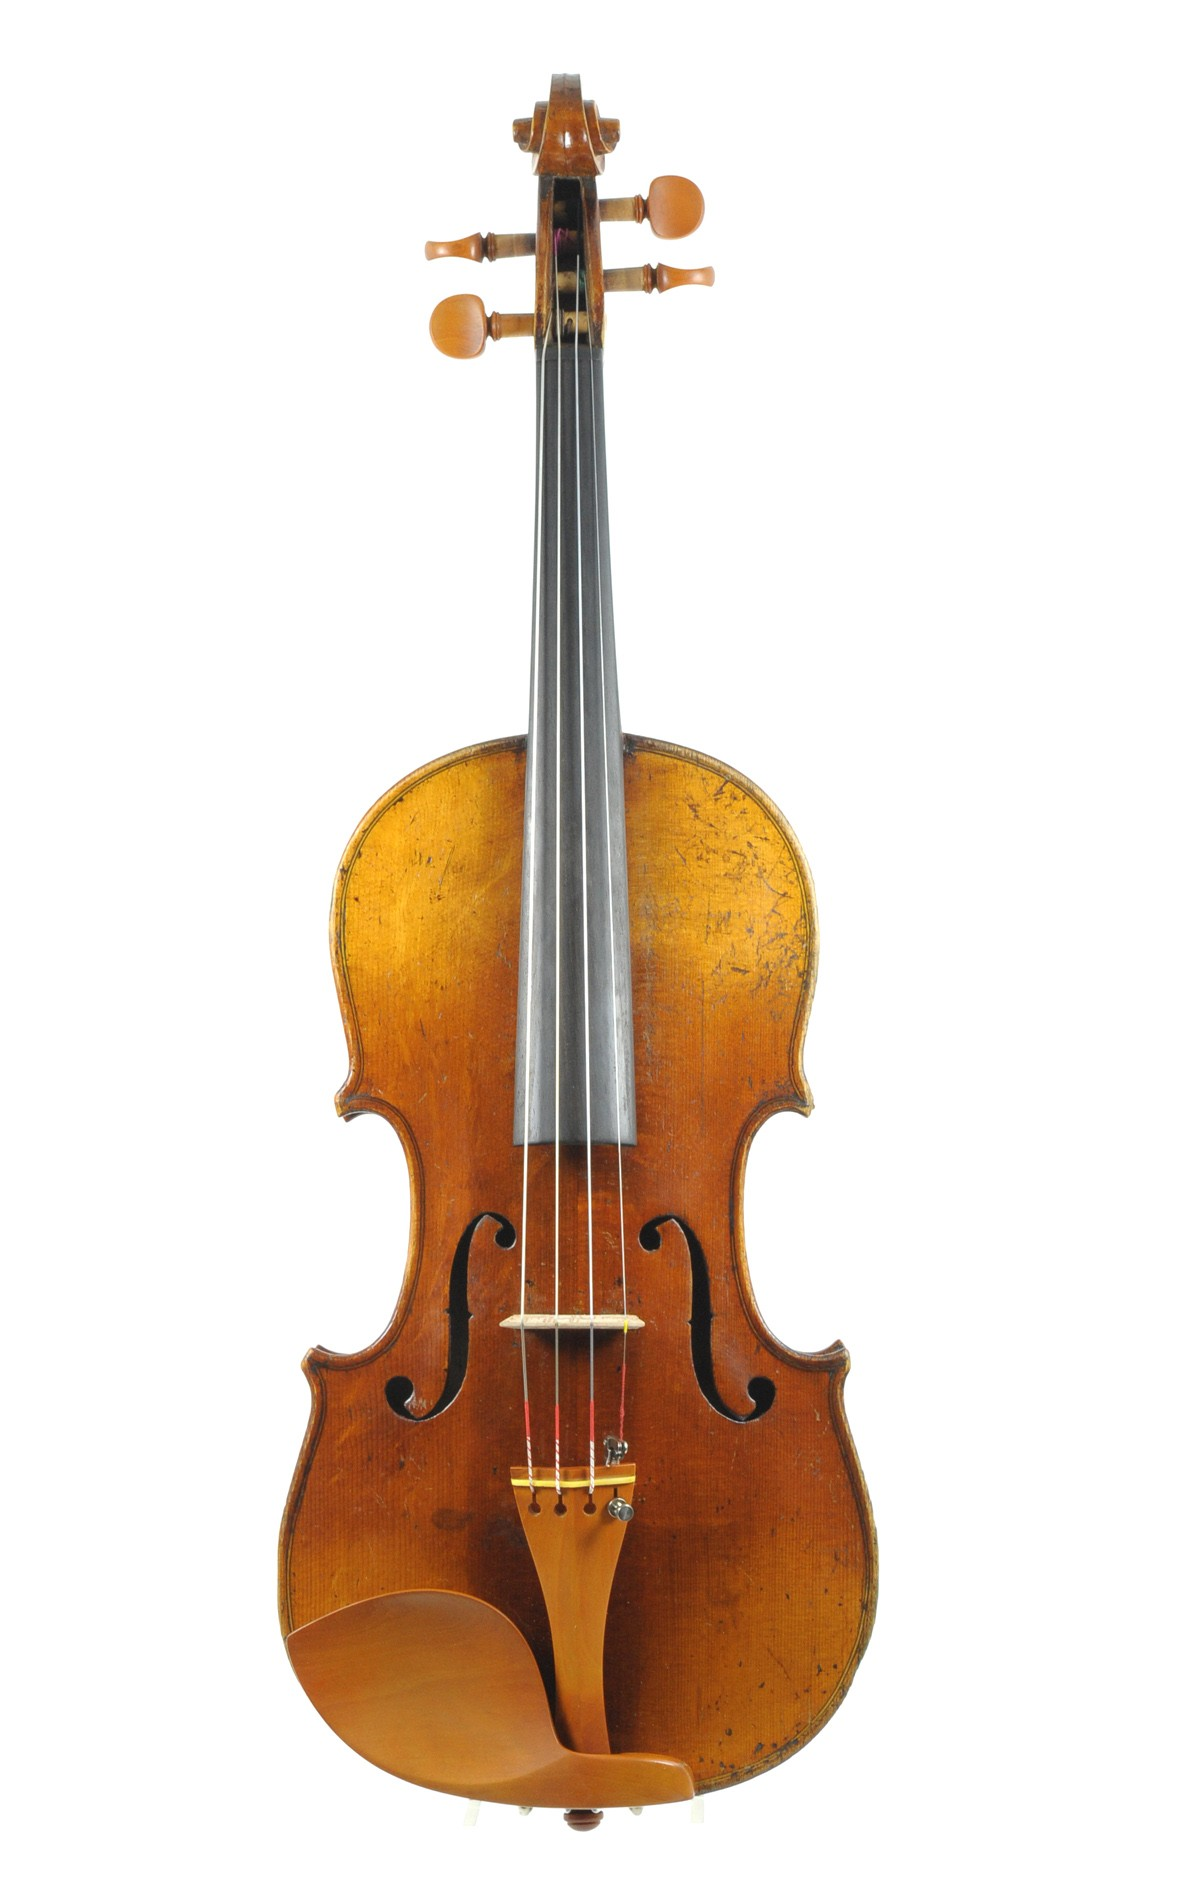 Hopf violin, Klingenthal approx. 1850 - top view